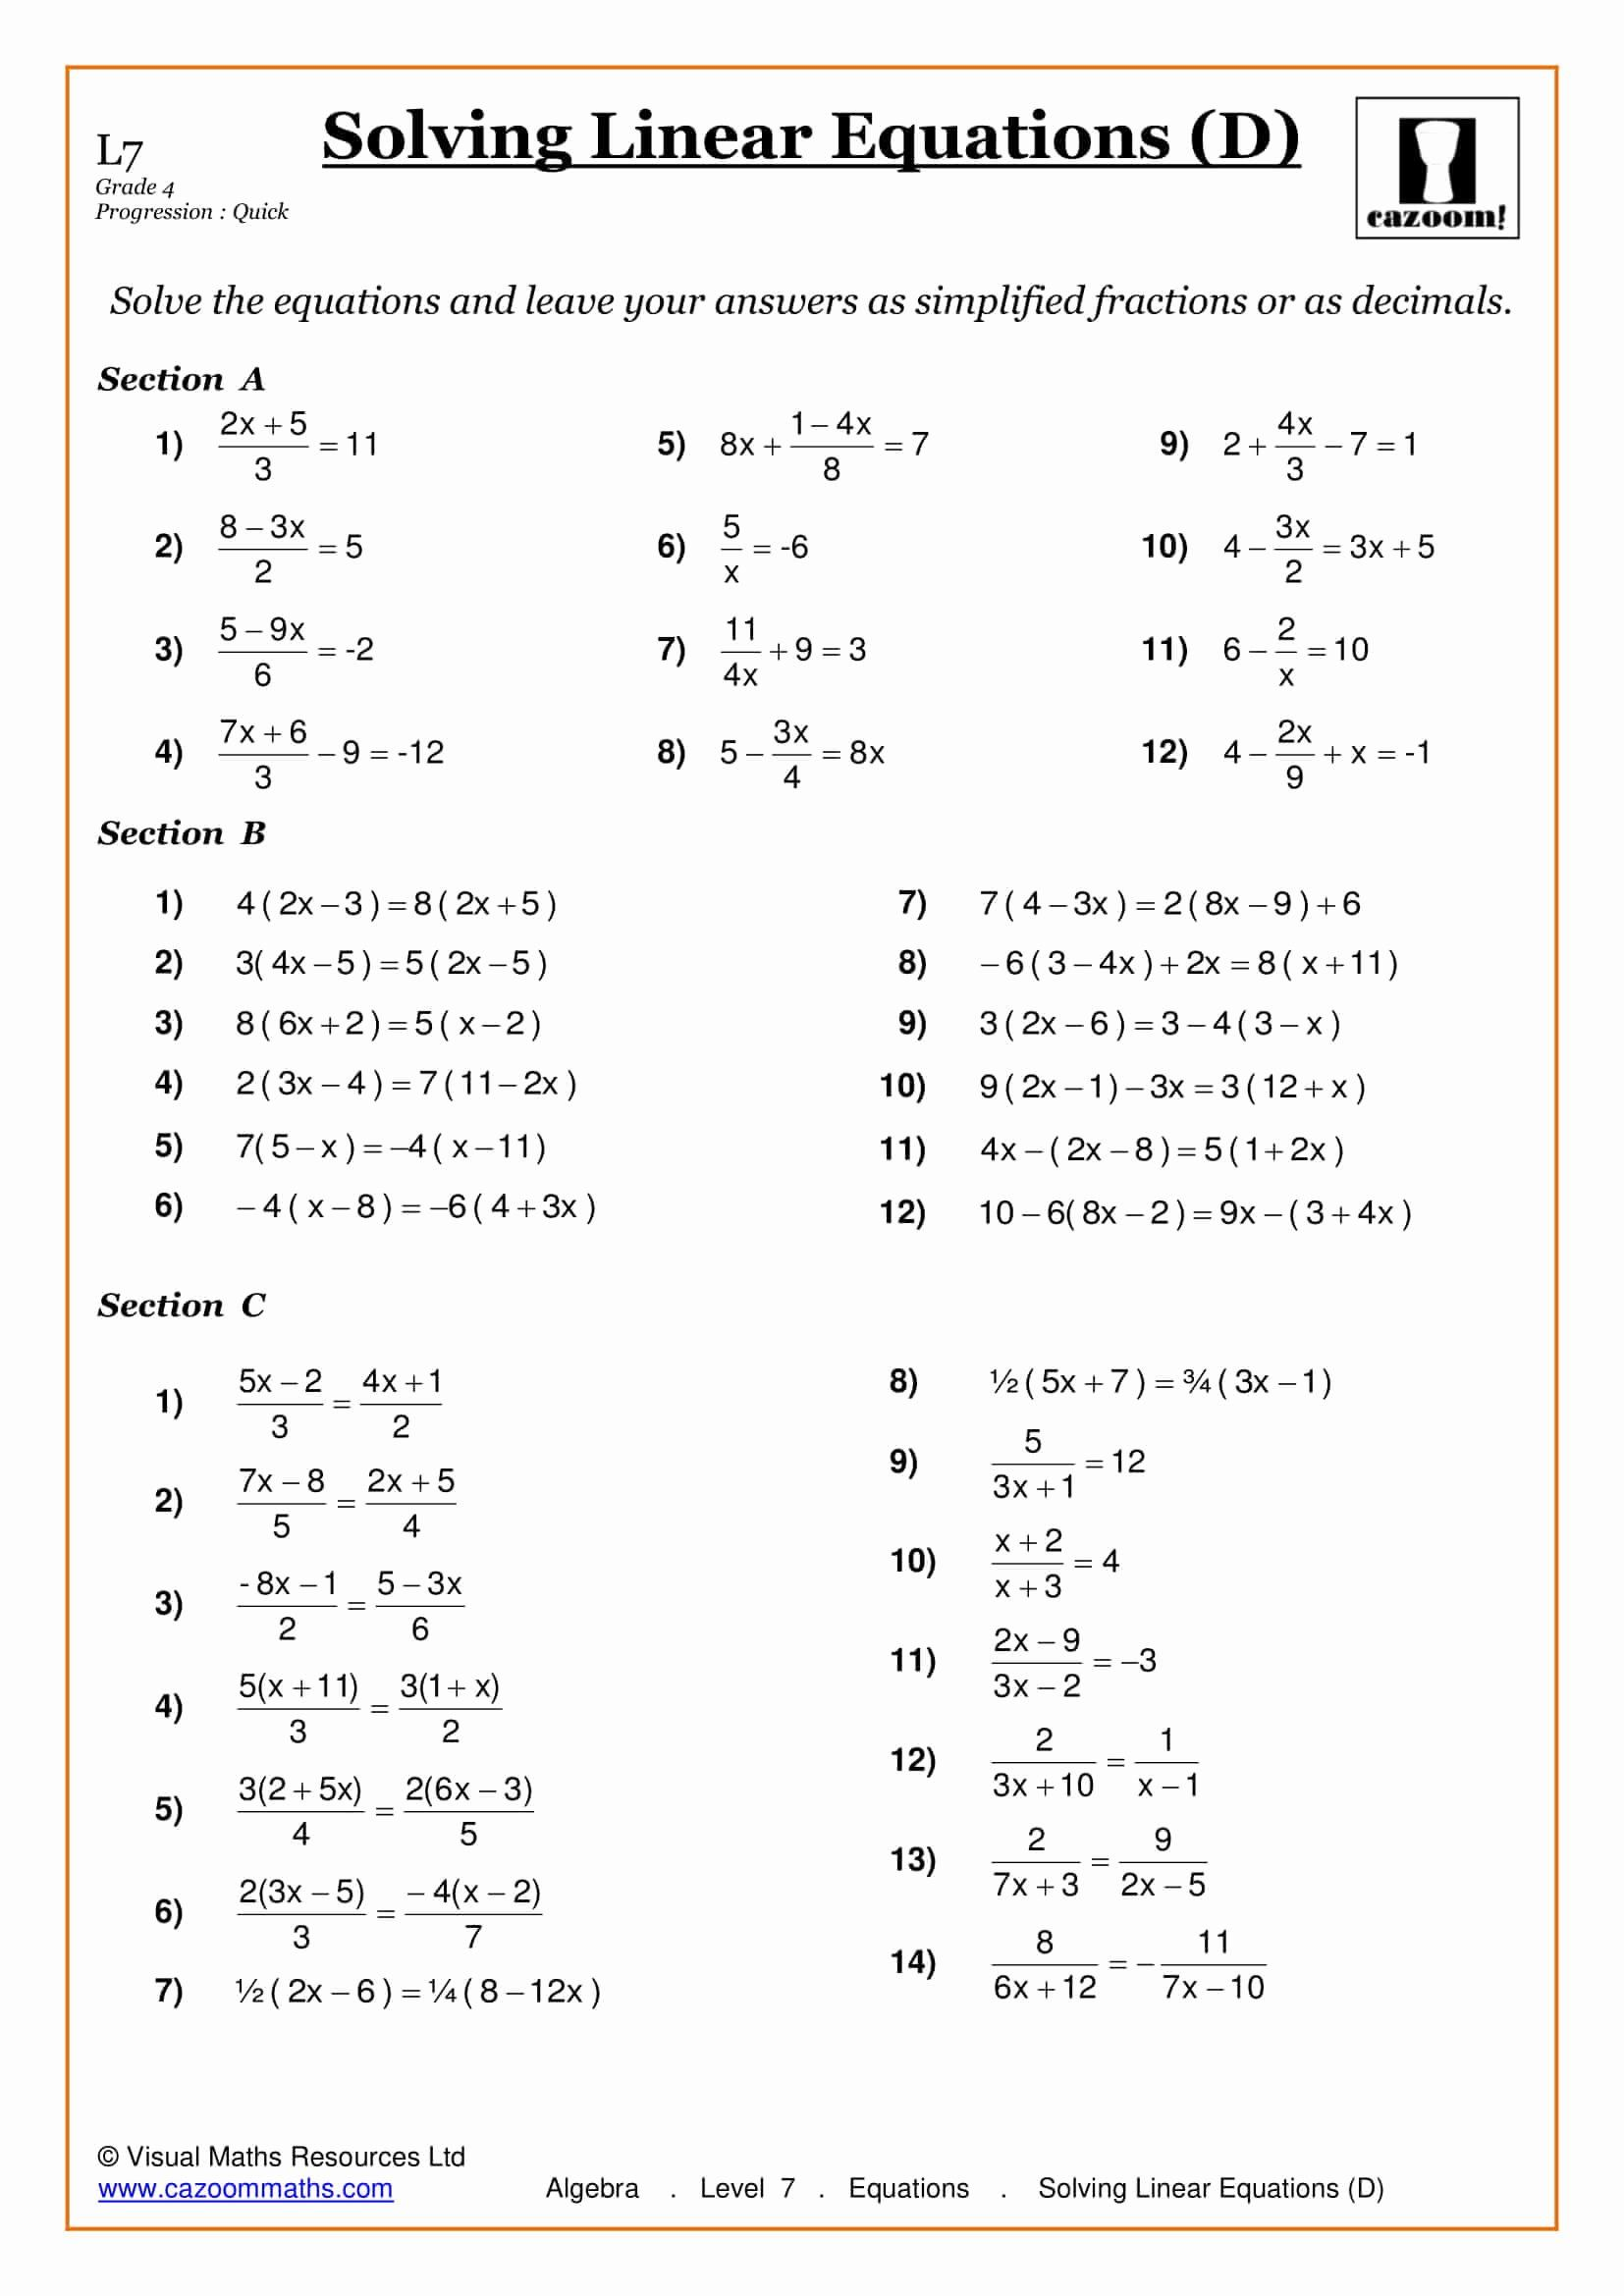 Solving Linear Equations Worksheet Best Of Solving